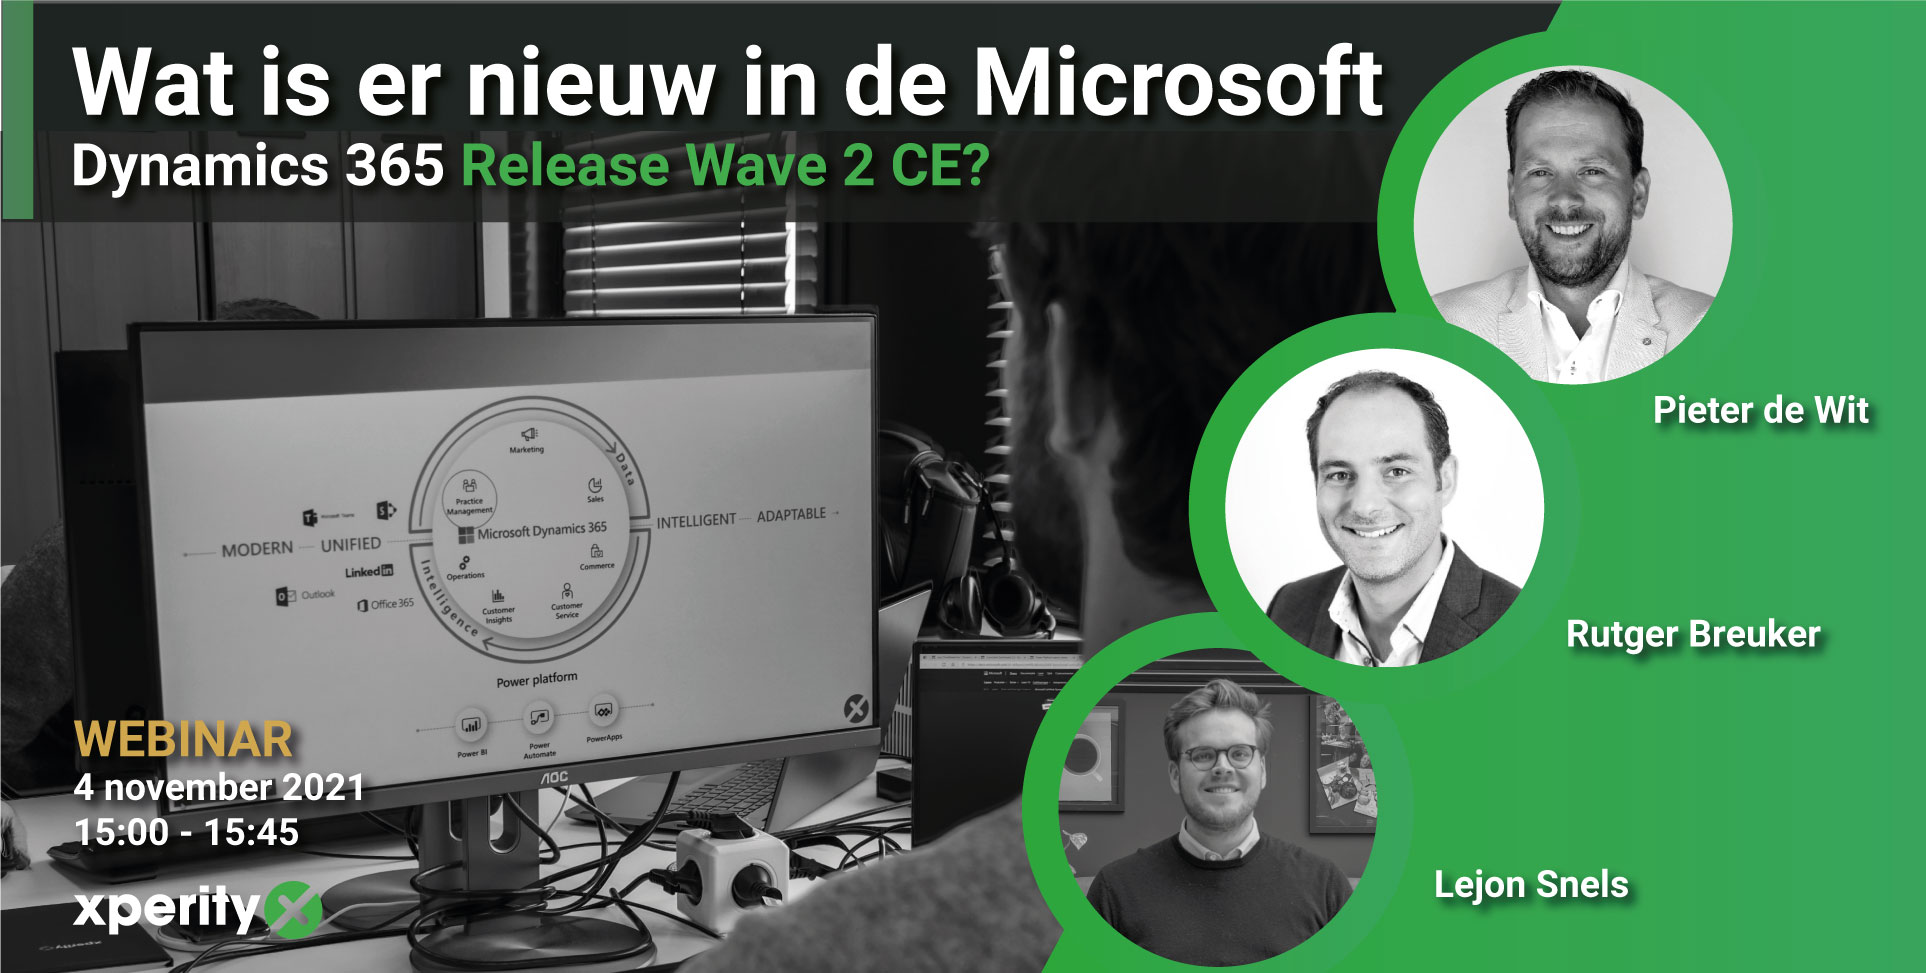 Wat is er nieuw in de Microsoft Dynamics 365 CE release 2021?